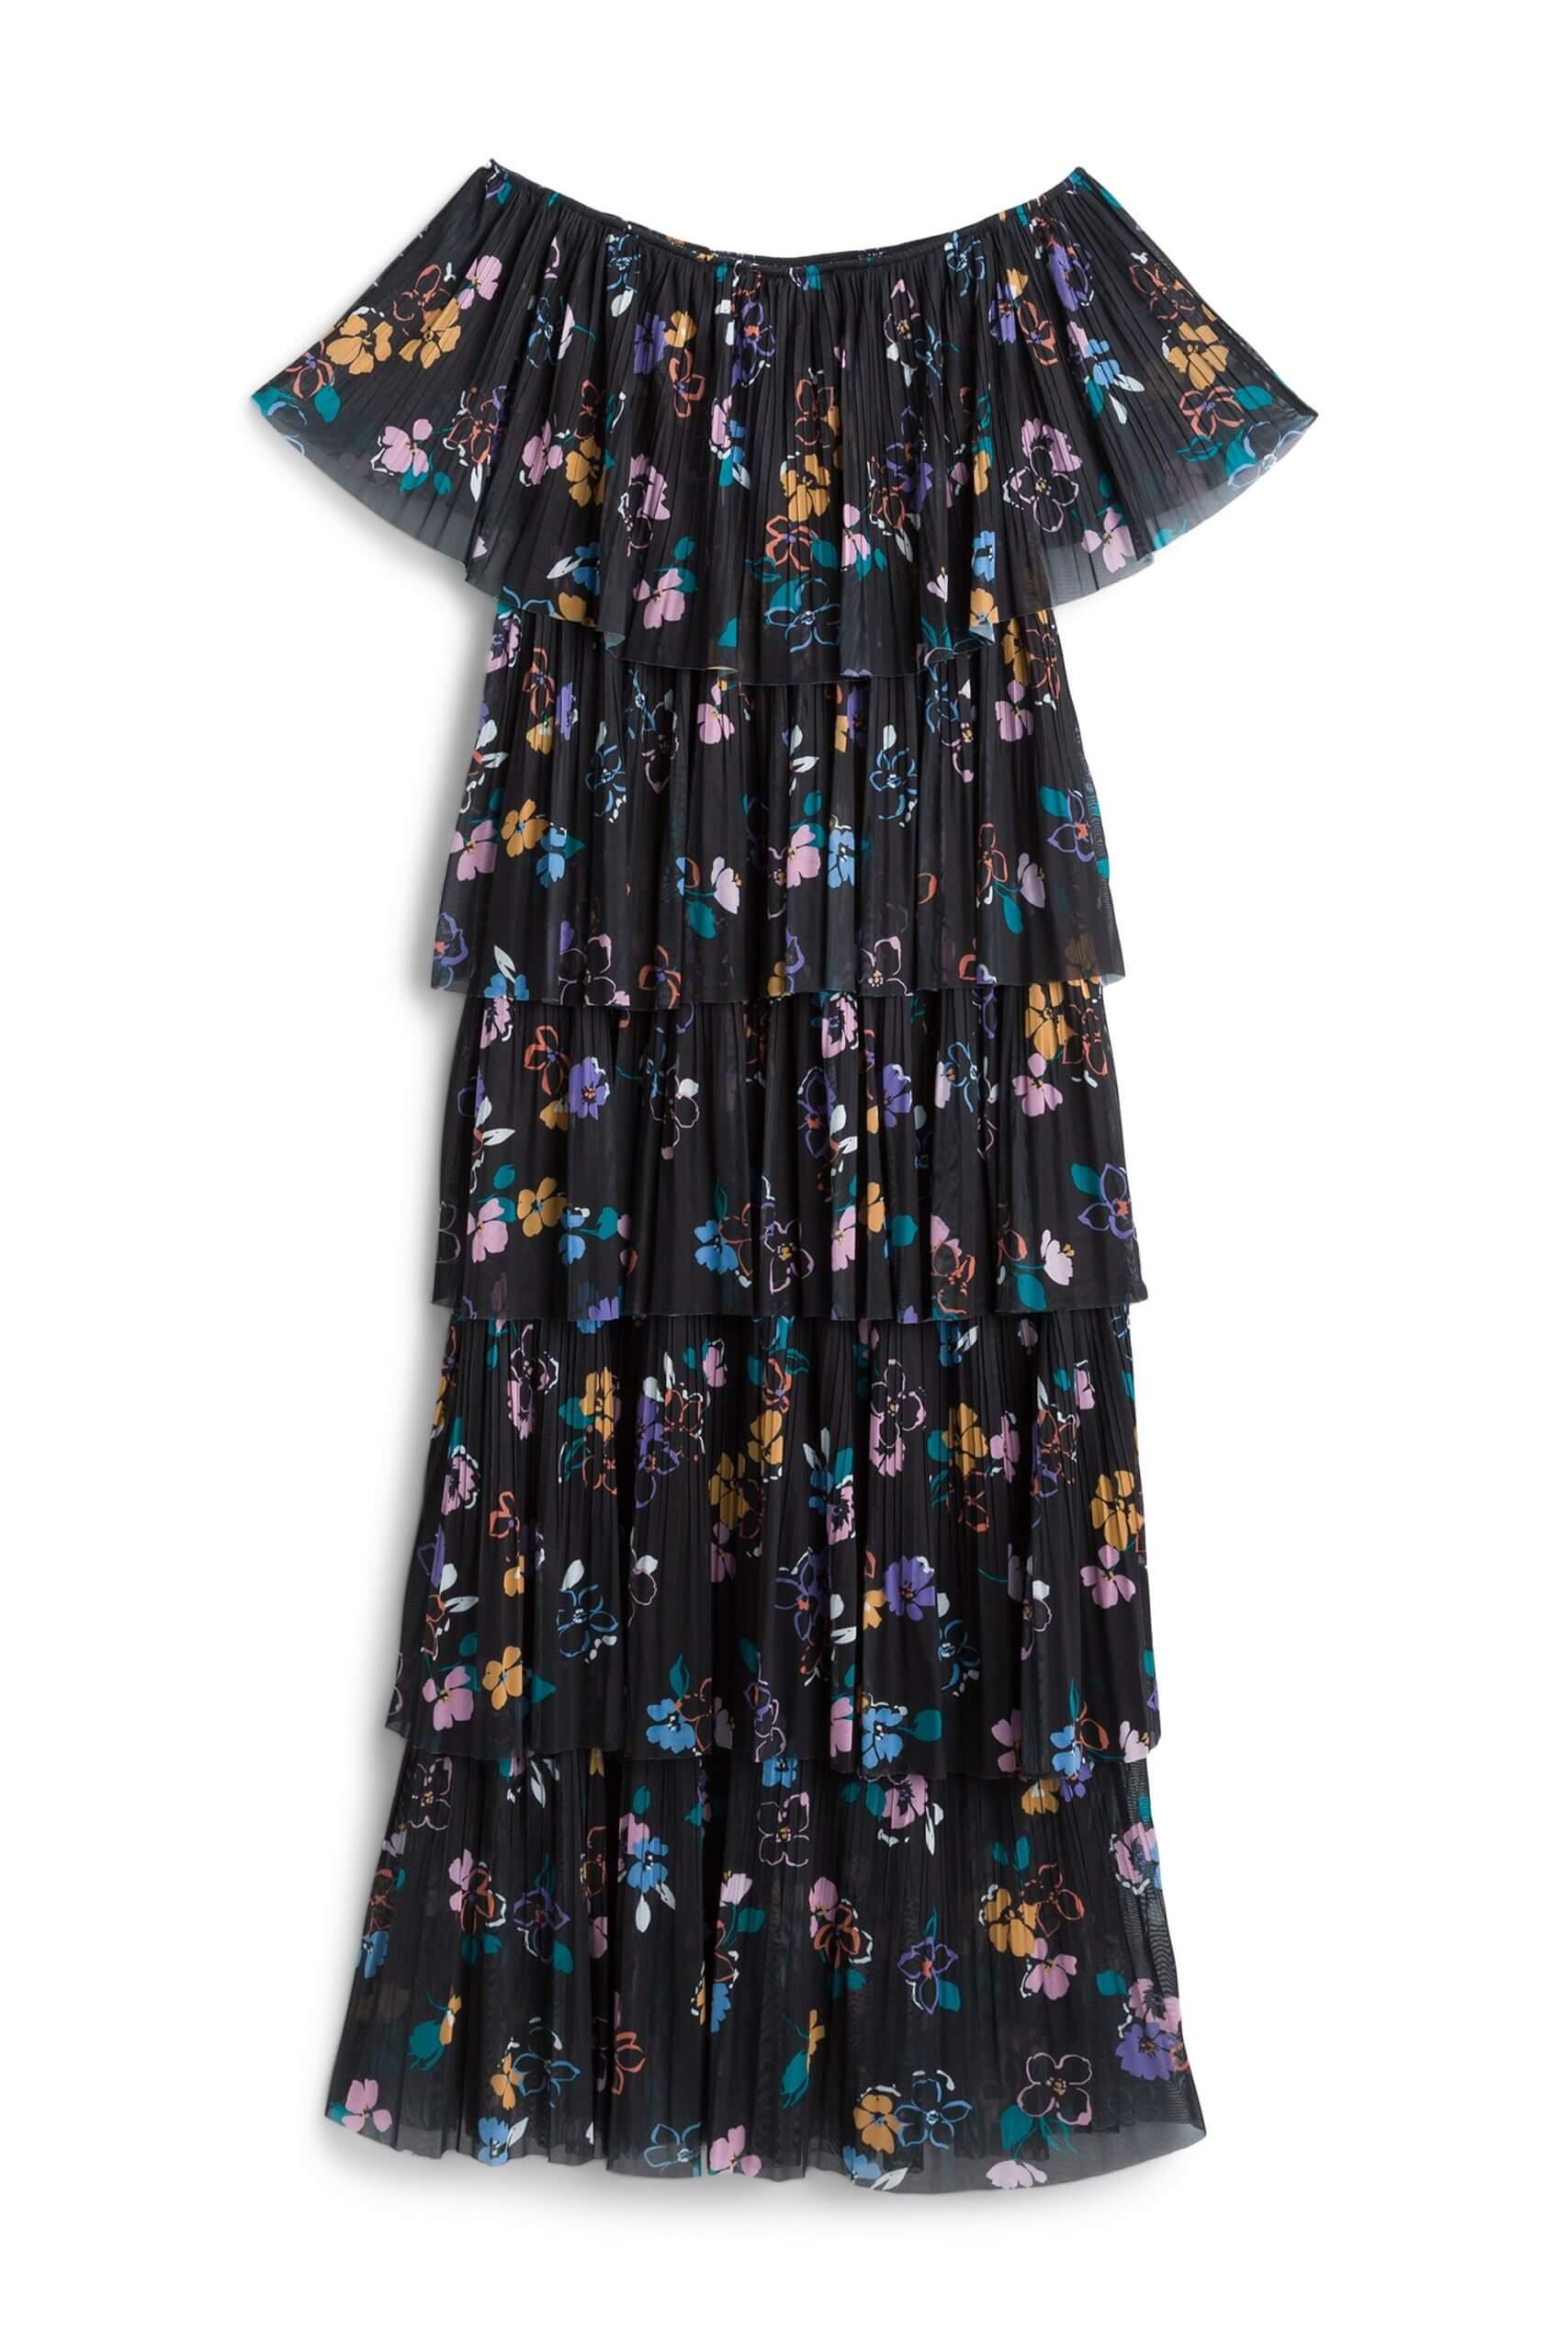 Stitch Fix women's navy floral maxi dress.